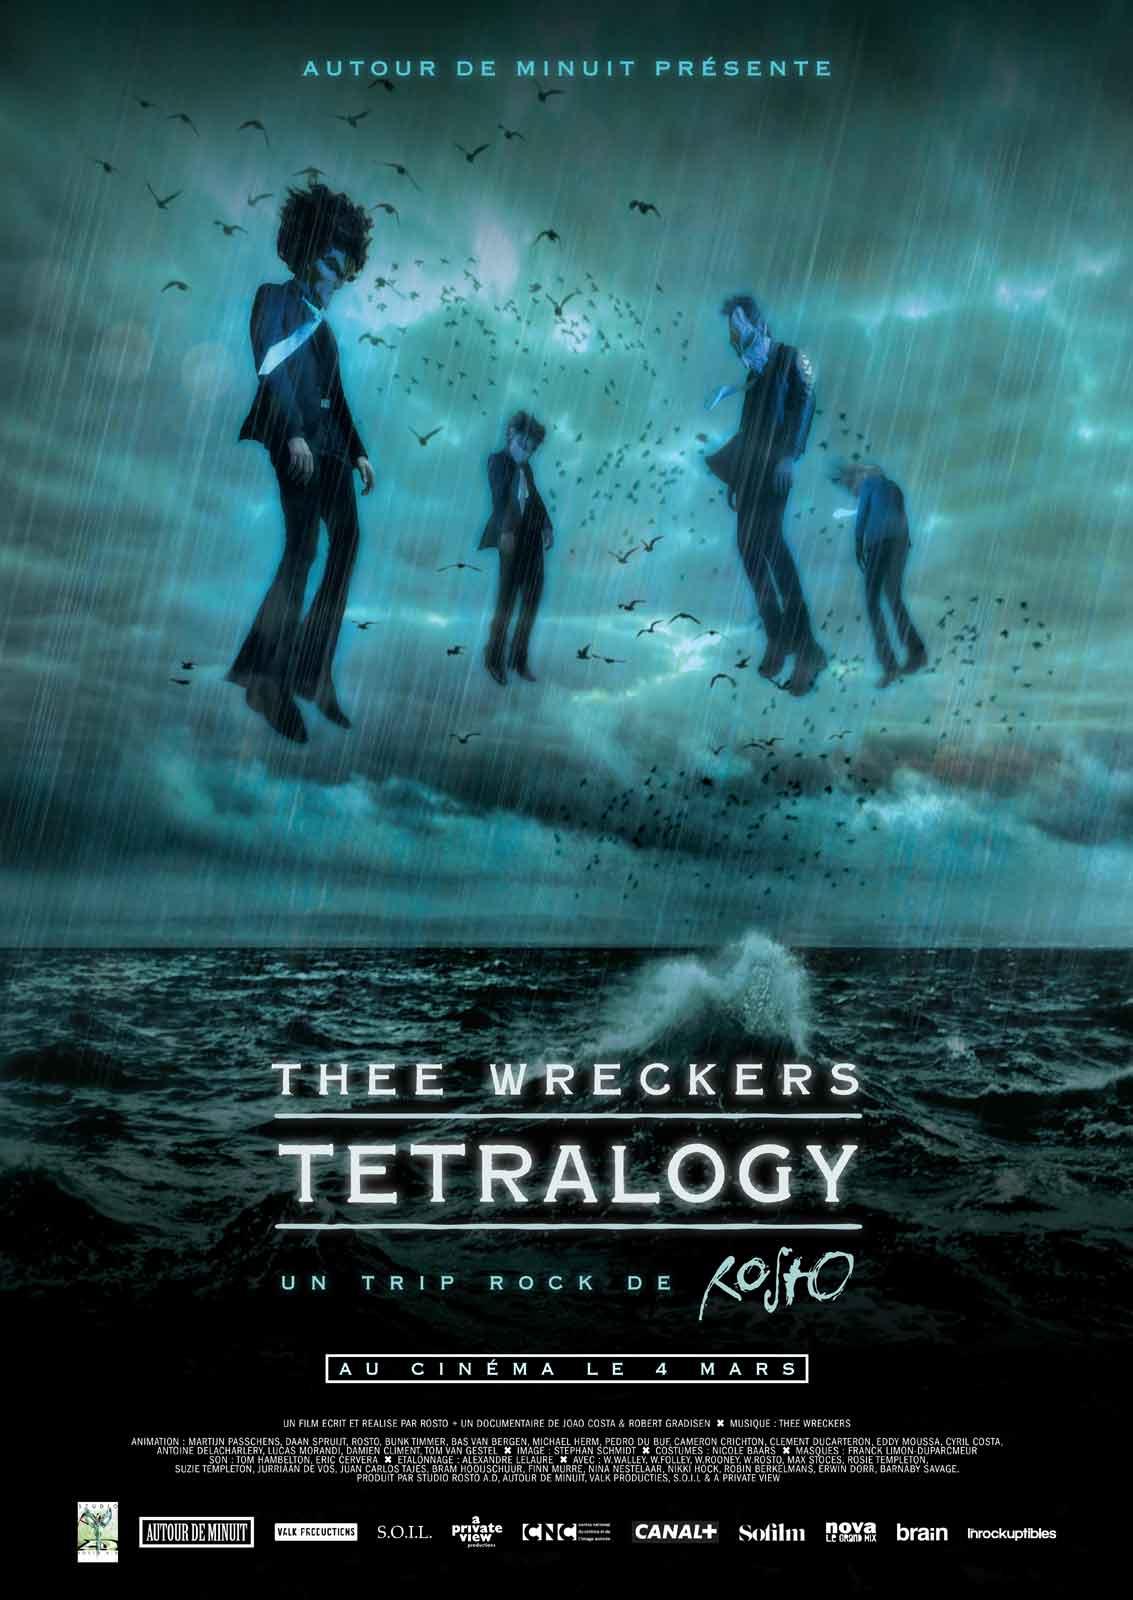 Image du film Thee Wreckers Tetralogy - Un trip rock de Rosto